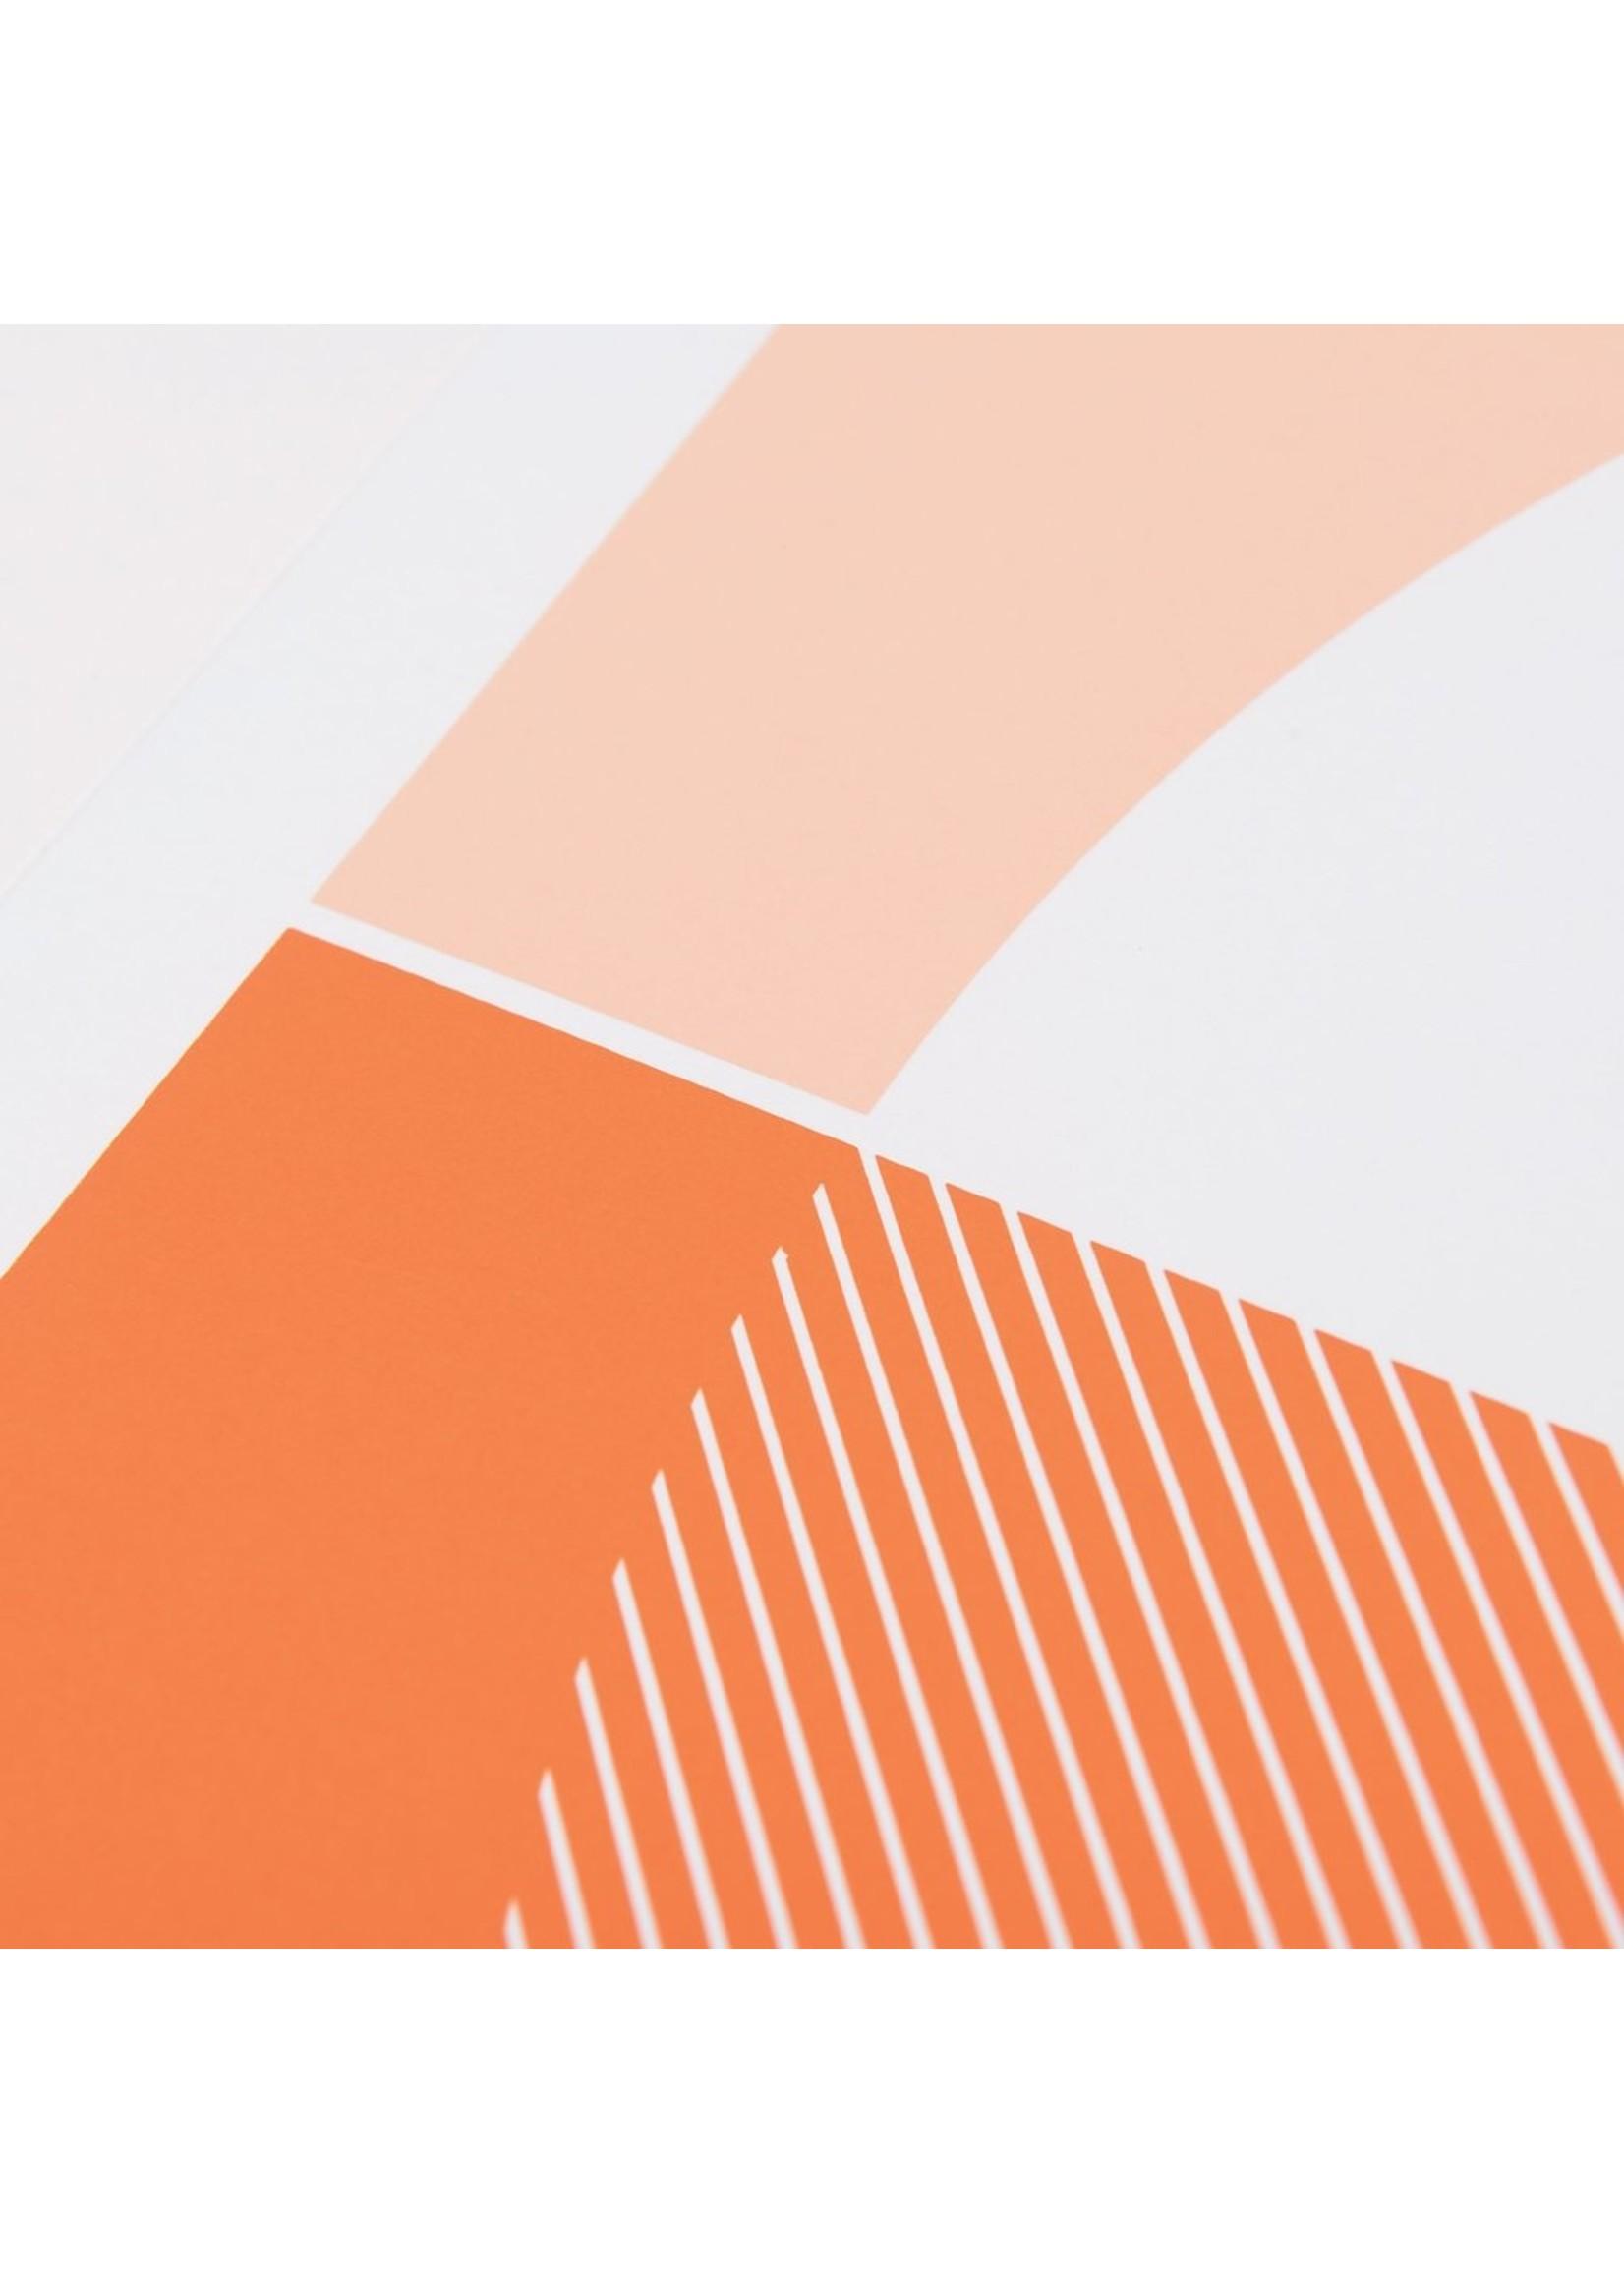 Tom Pigeon Tom Pigeon Cellardyke Pink Print - A2